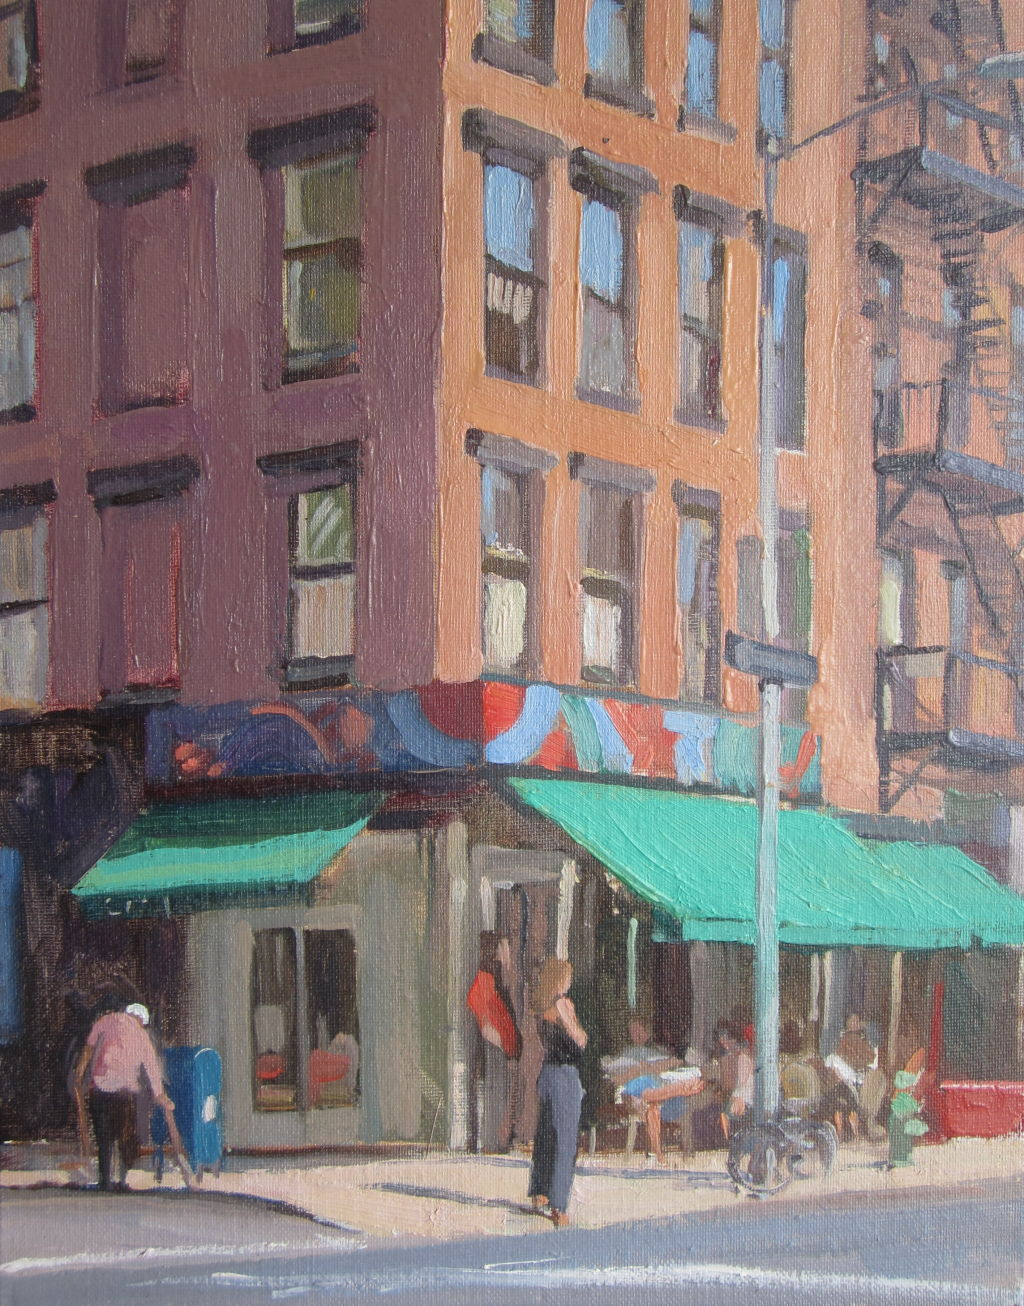 Tomkins Square, New York, Sunday morning